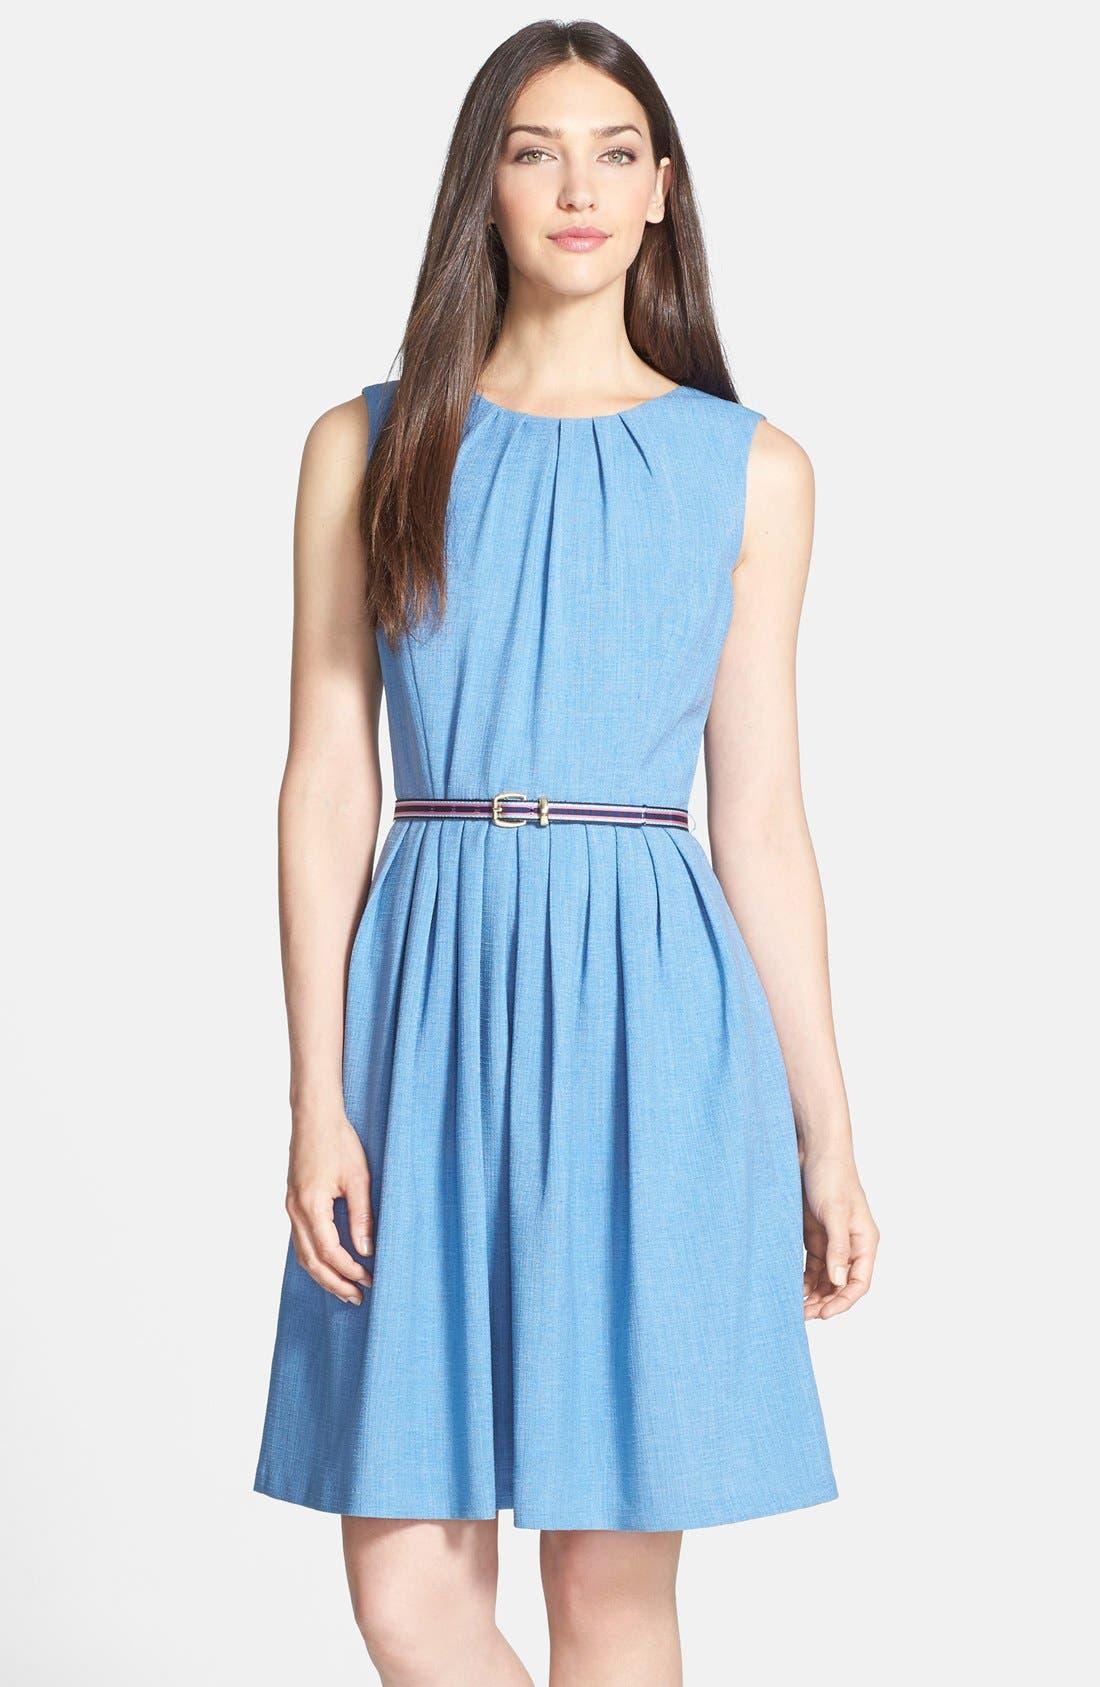 Alternate Image 1 Selected - Ellen Tracy Belted Fit & Flare Dress (Petite)